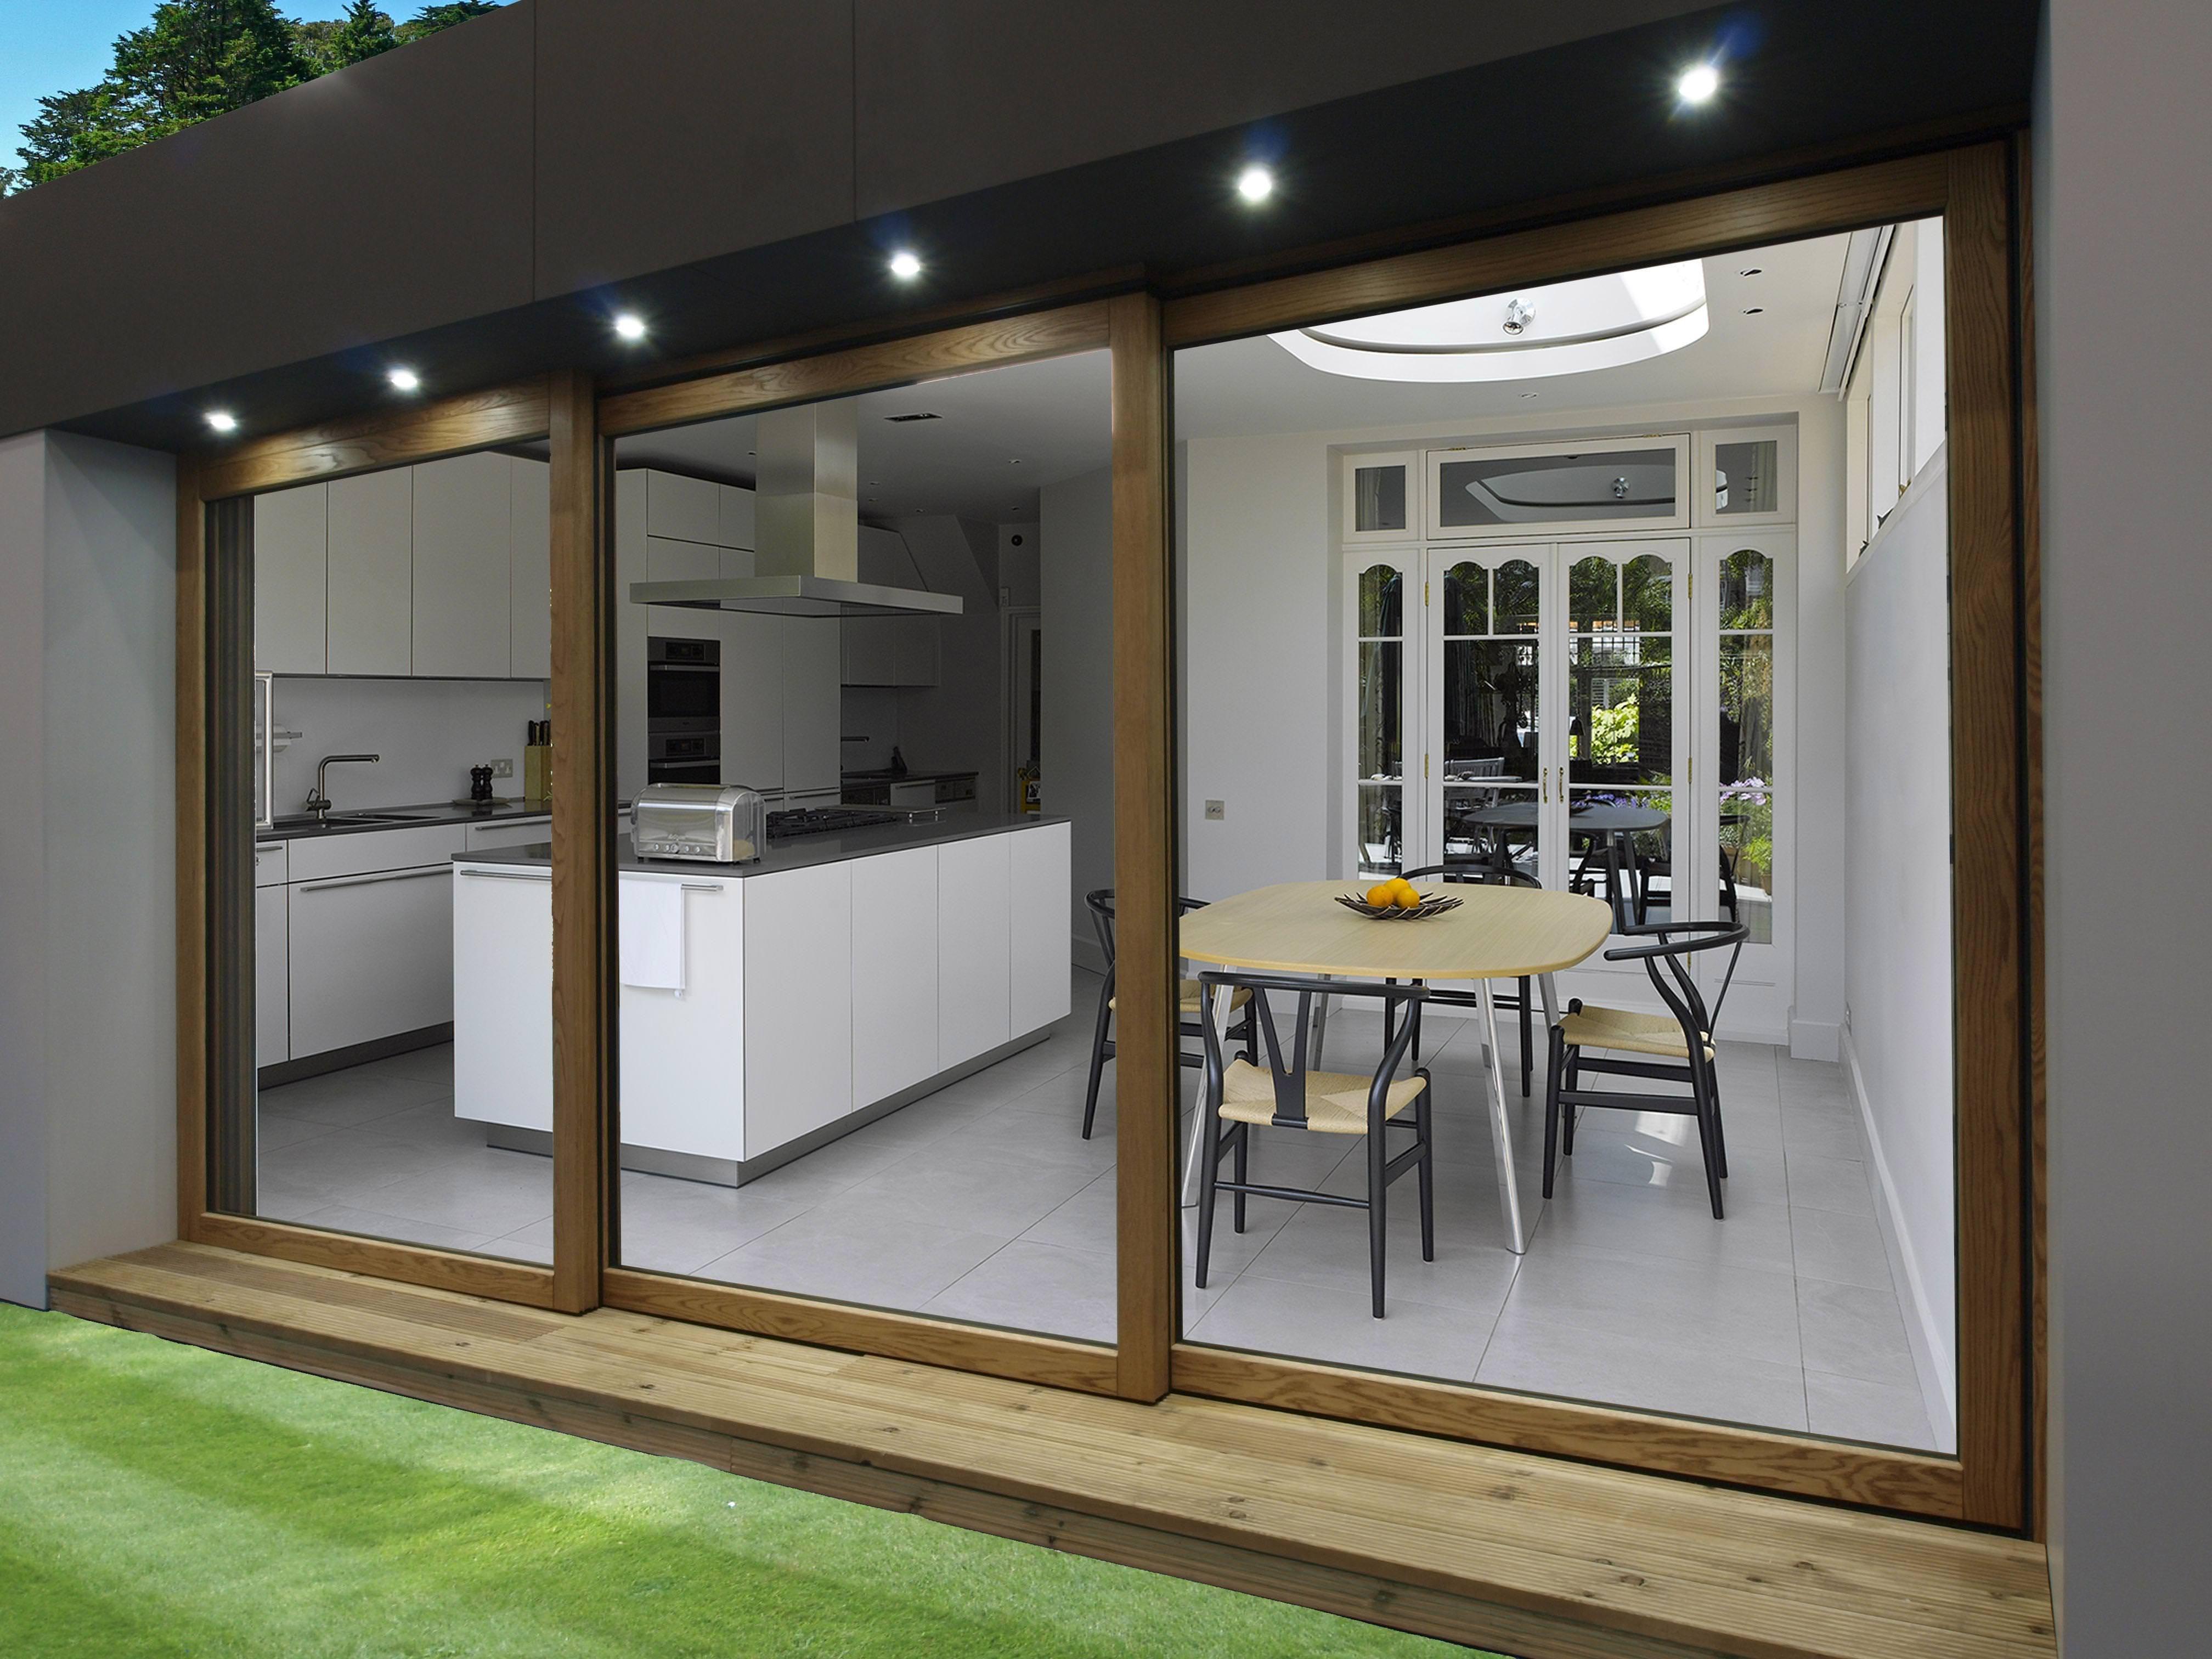 Madera en casa moderno windows puertas correderas for Puertas para casa exterior